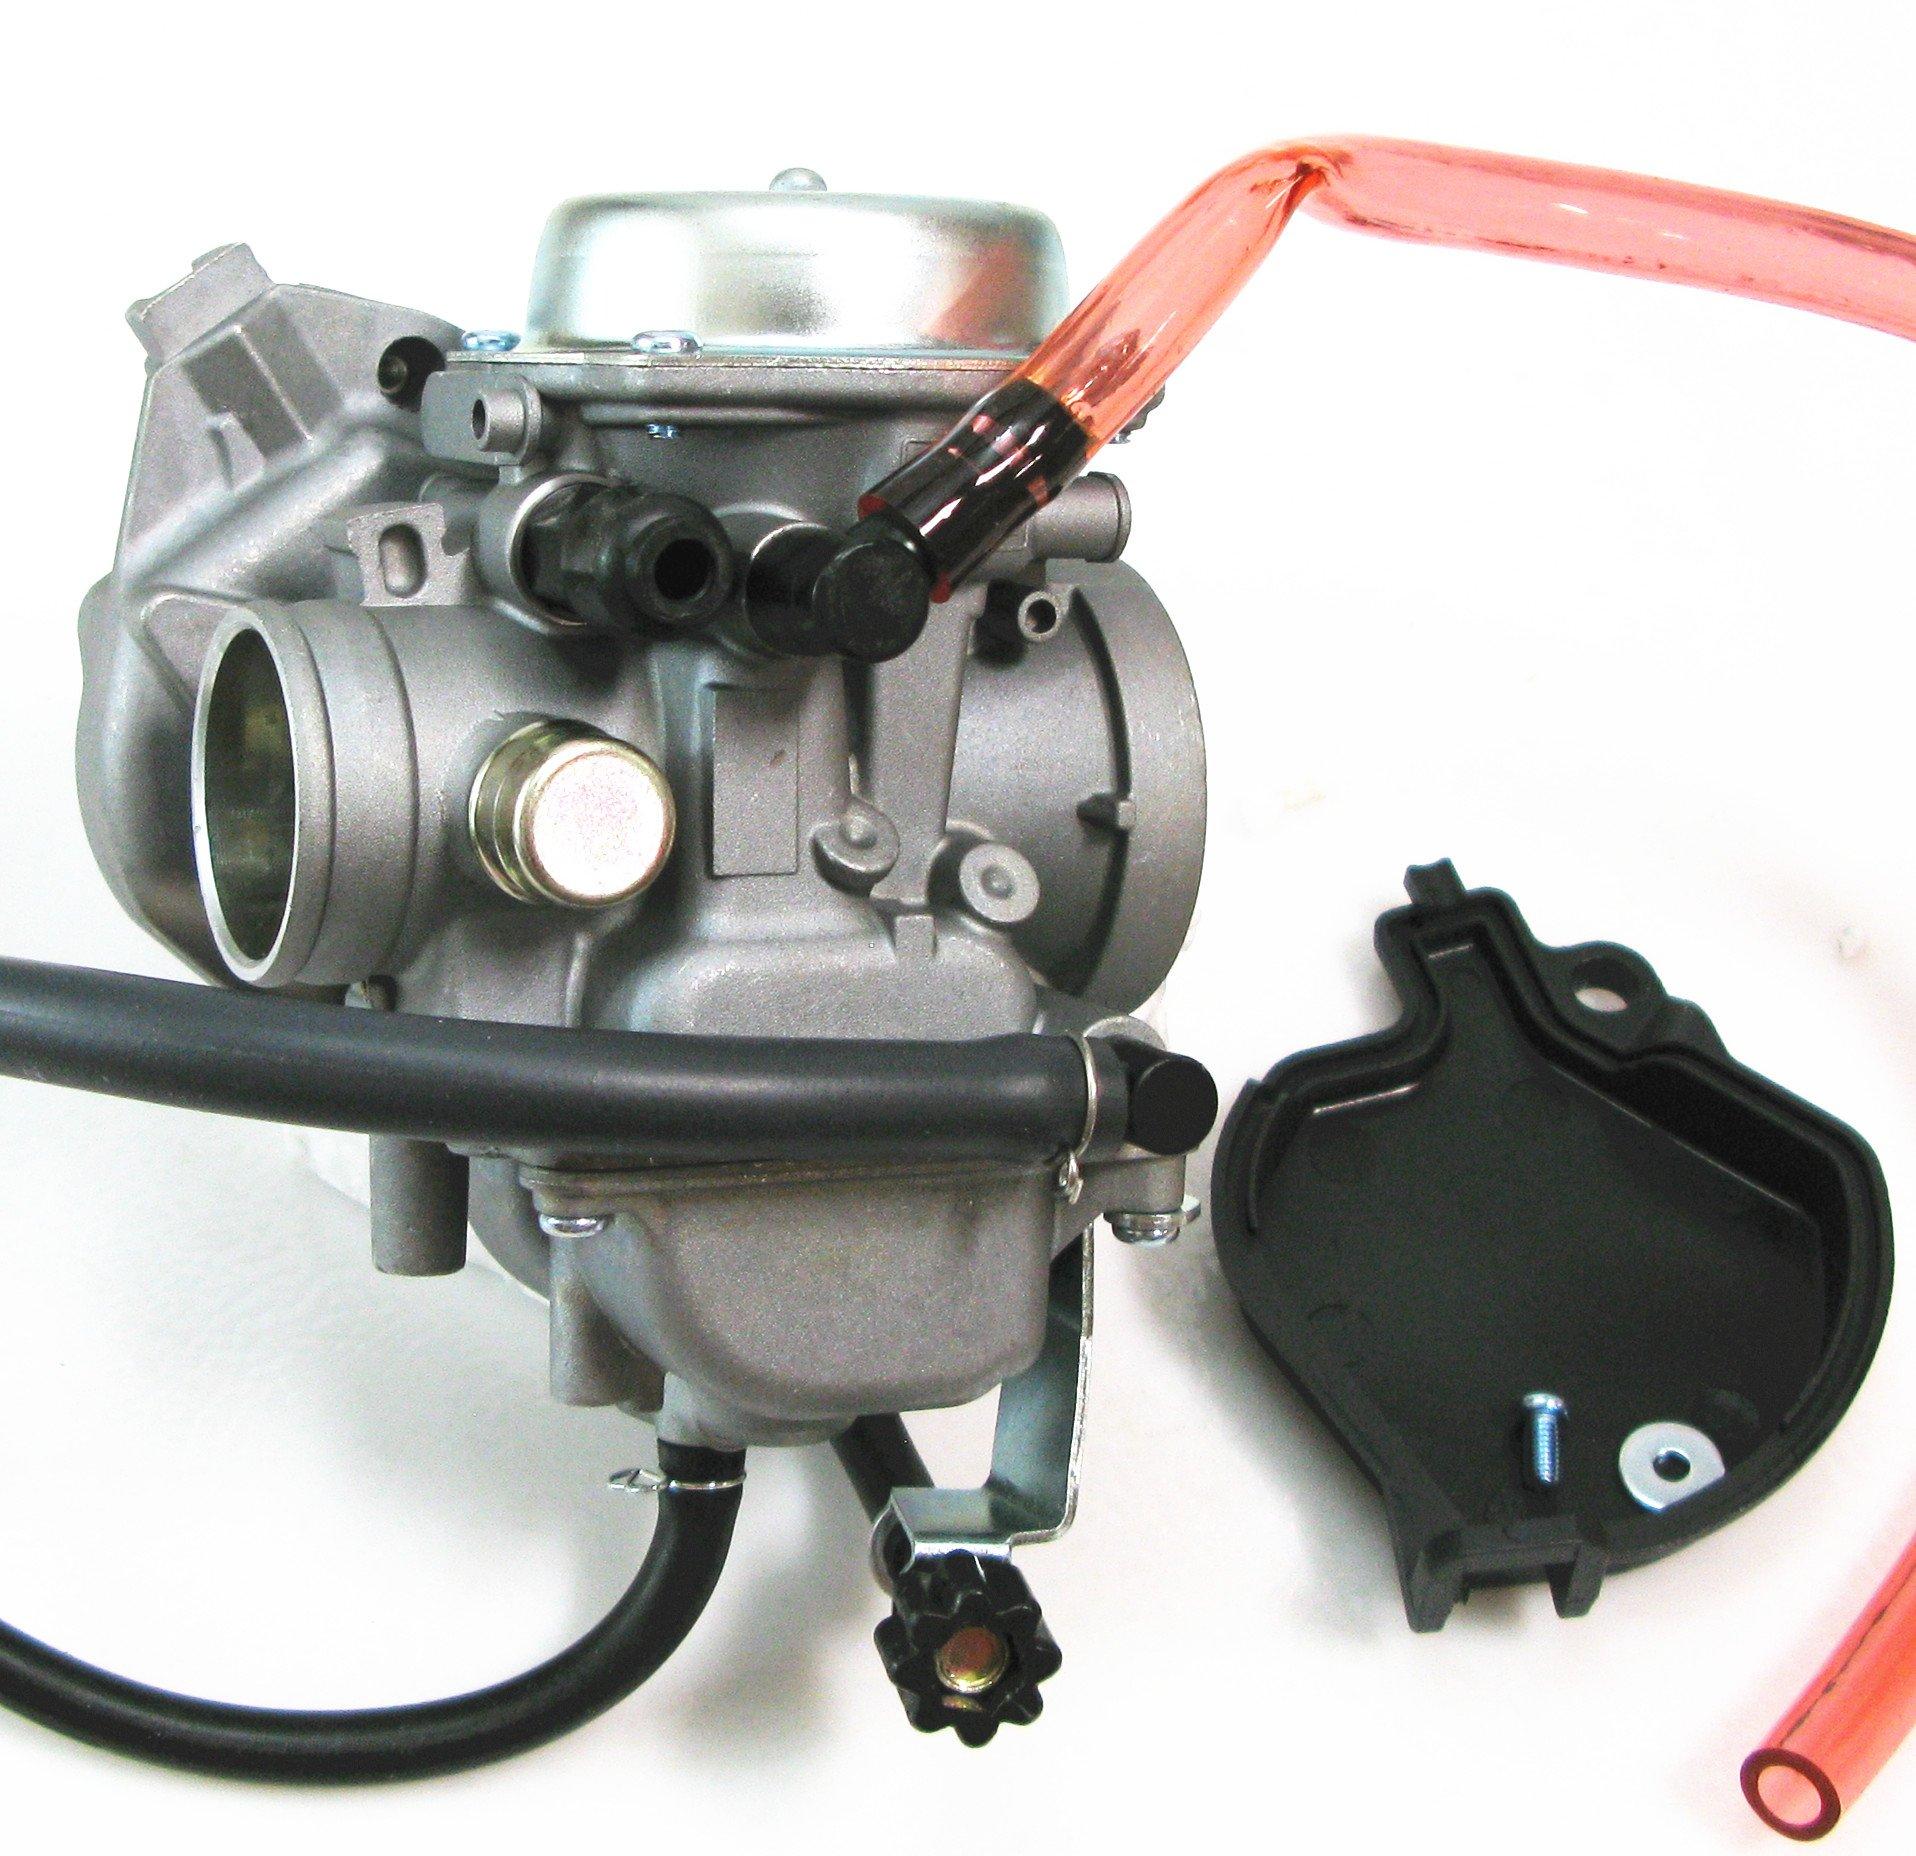 Carburetor for Kawasaki Lakota 300 KEF300B Sport KEF300A 1995-2003 by Motor Buddies (Image #2)